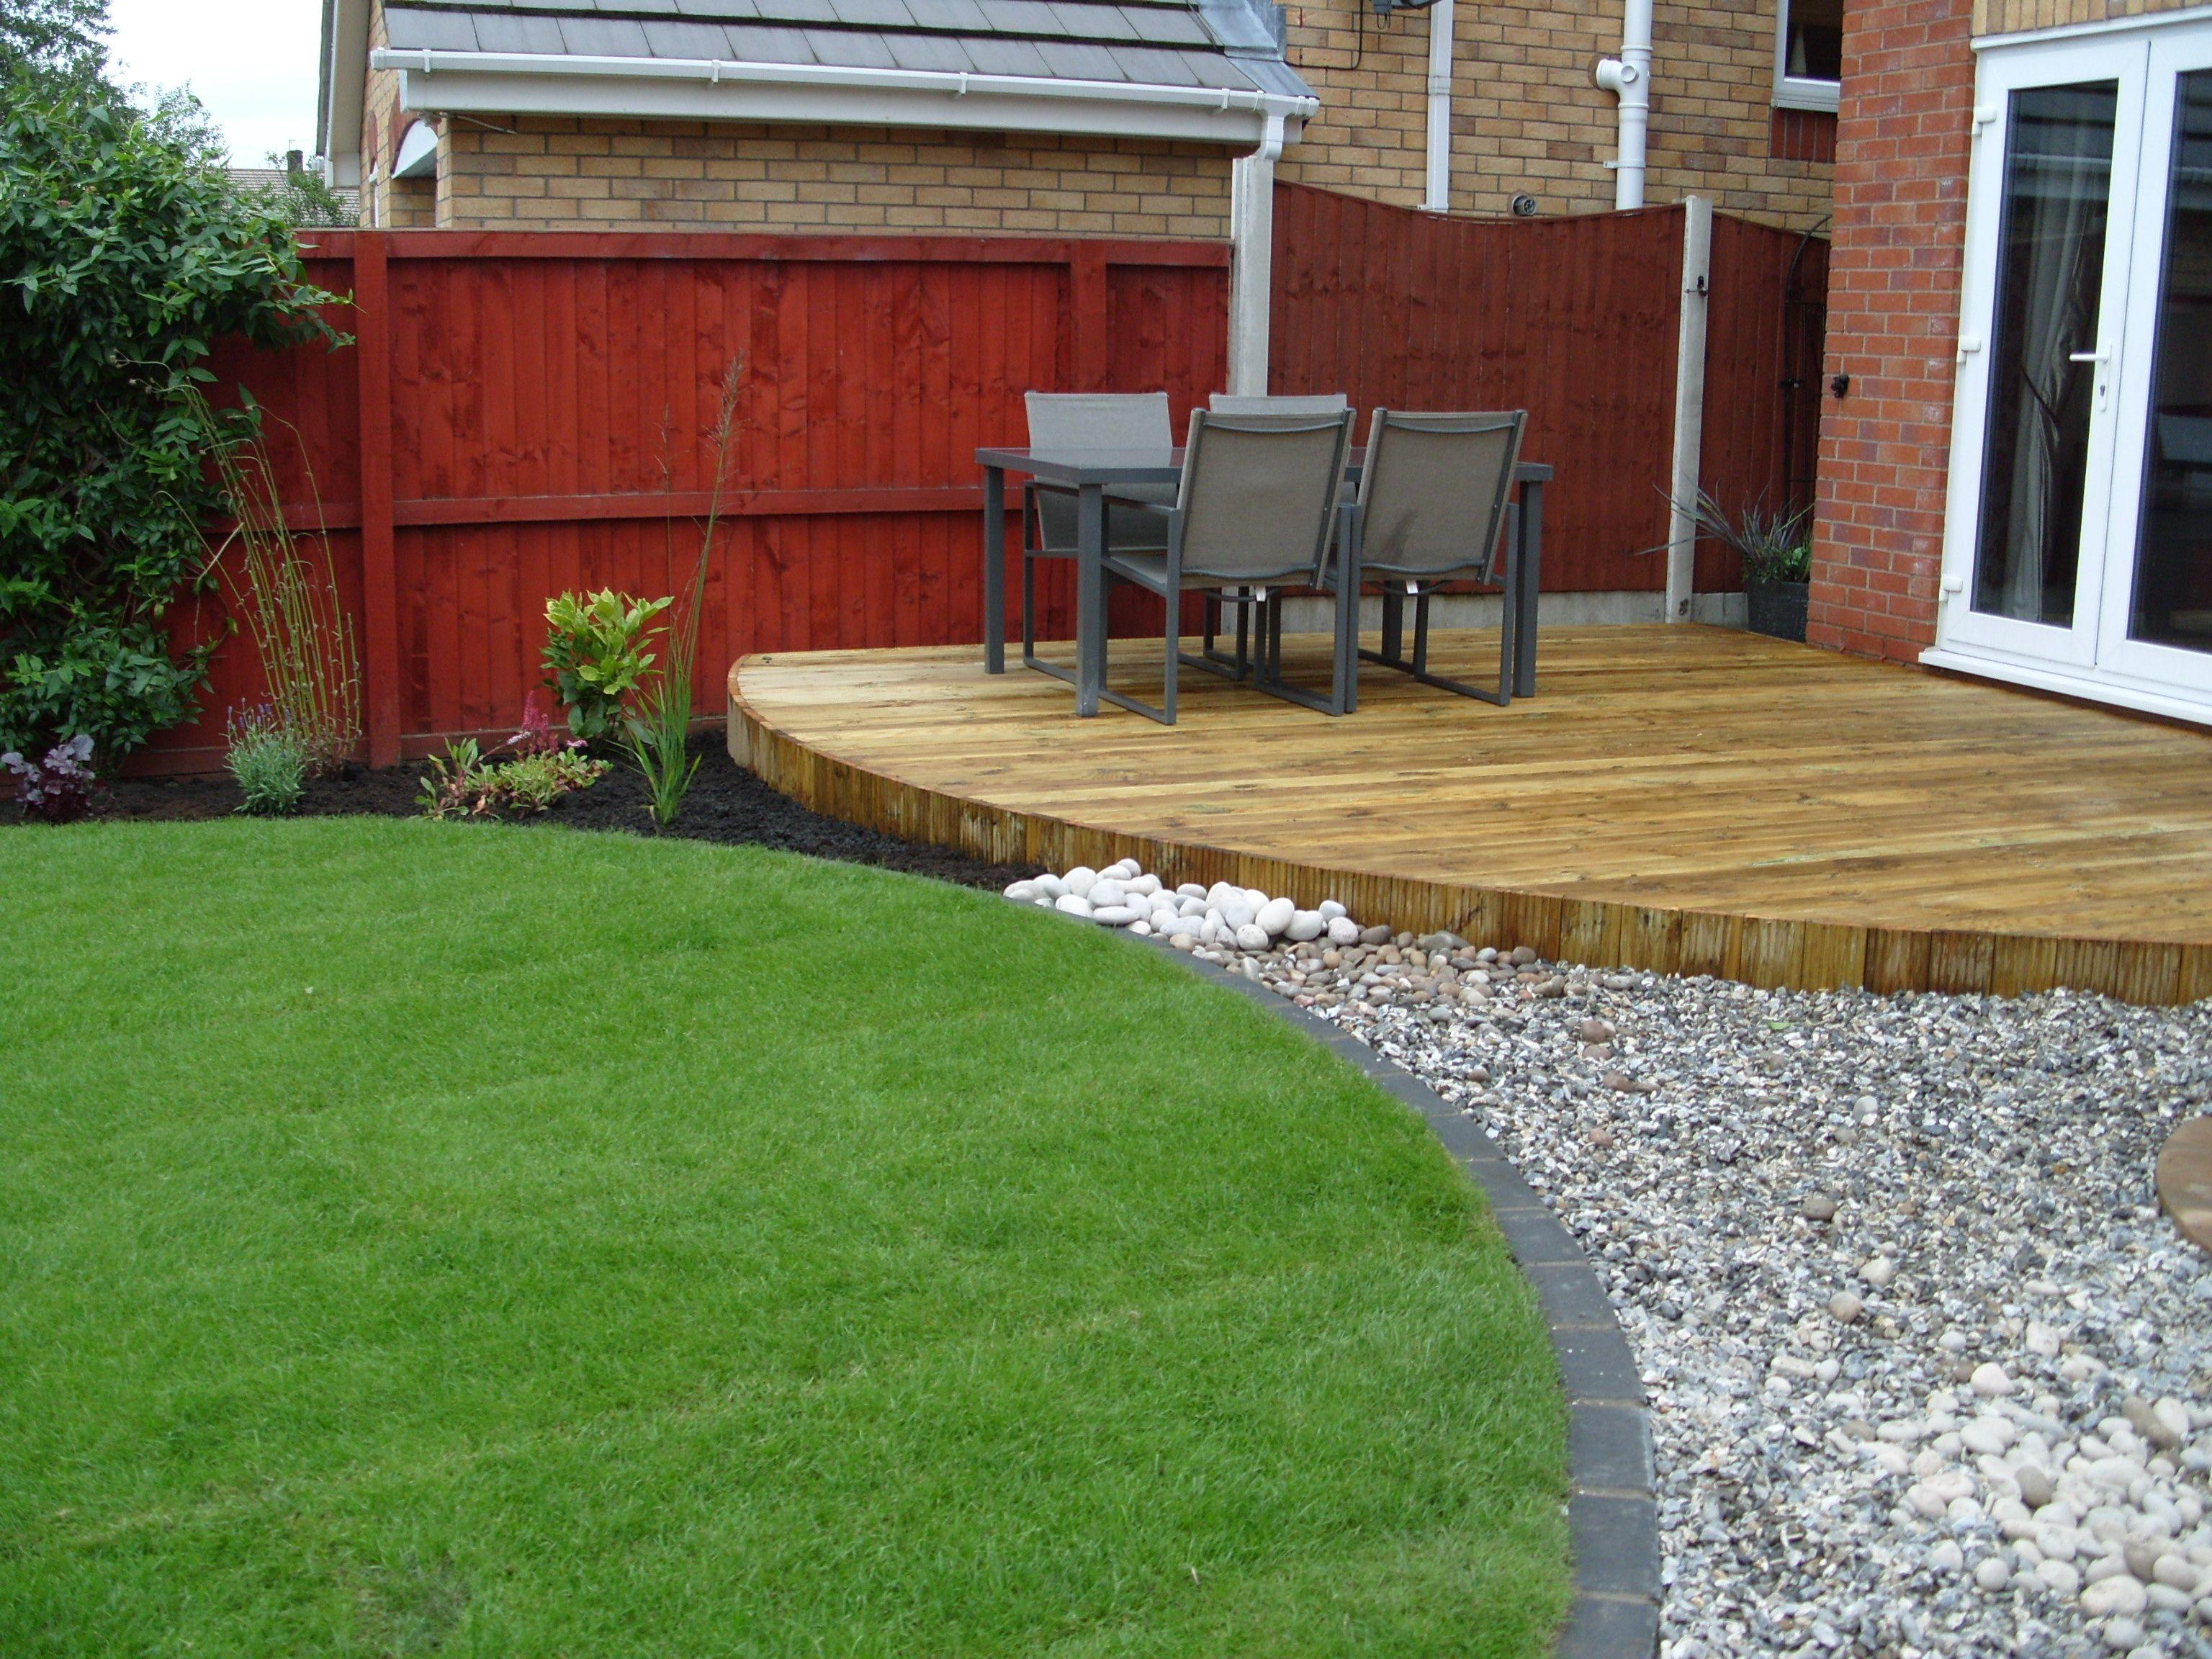 Curves And More Curves Hardscaping Small Garden Design Small Backyard Decks Deck Designs Backyard